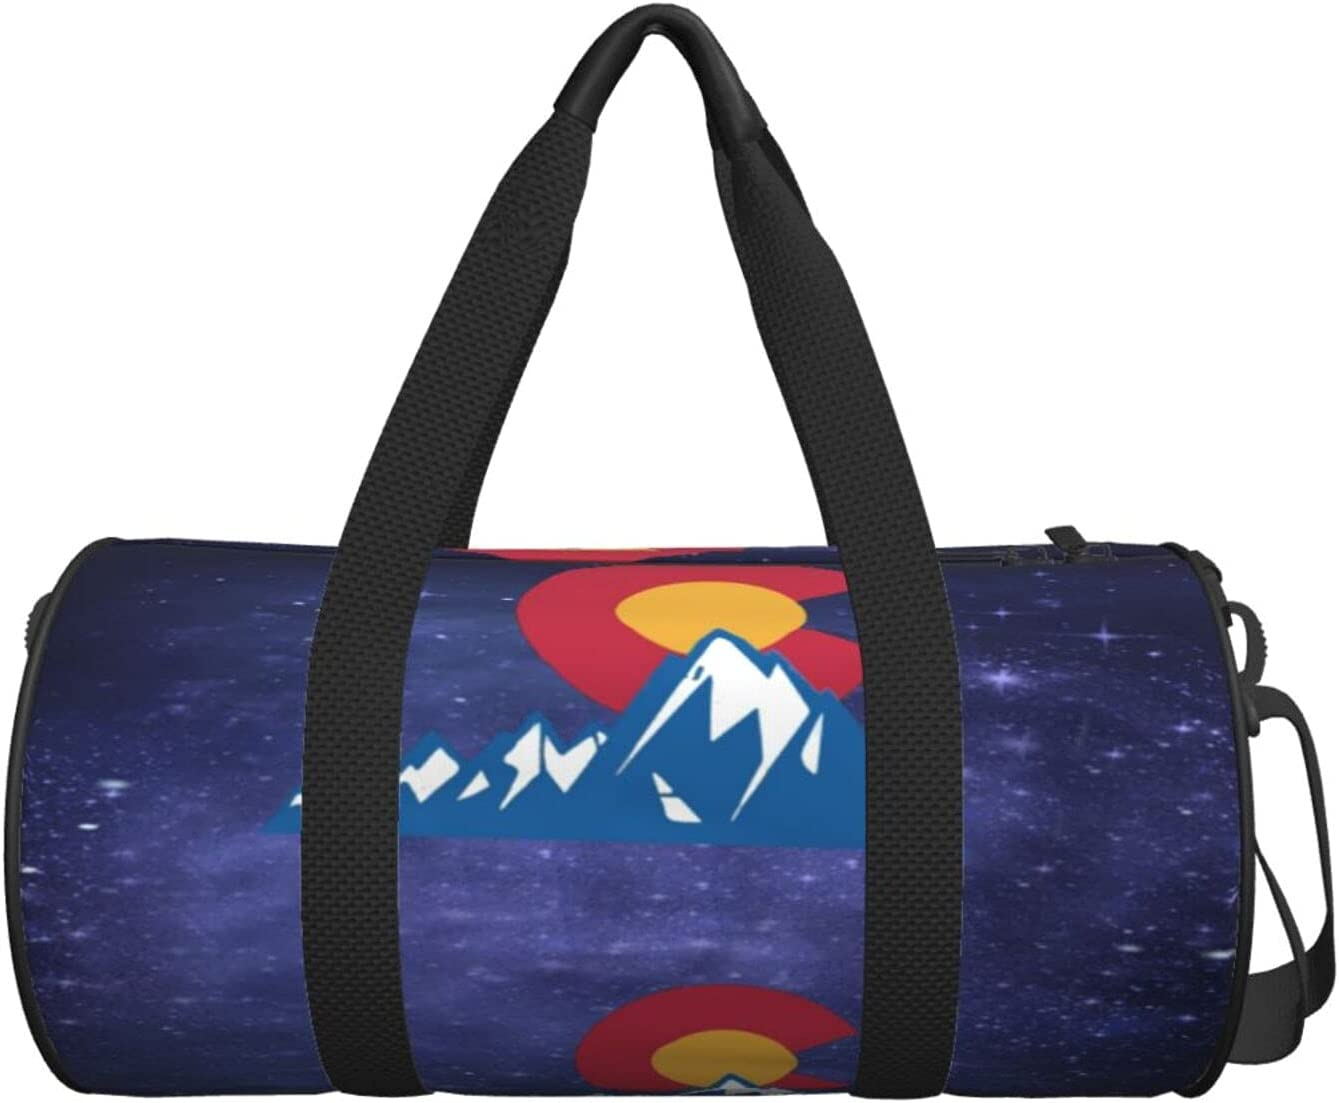 Sports Duffel Bags Galaxy Colorado State Mountains Flag Bag Max 86% OFF Gym 2021 model